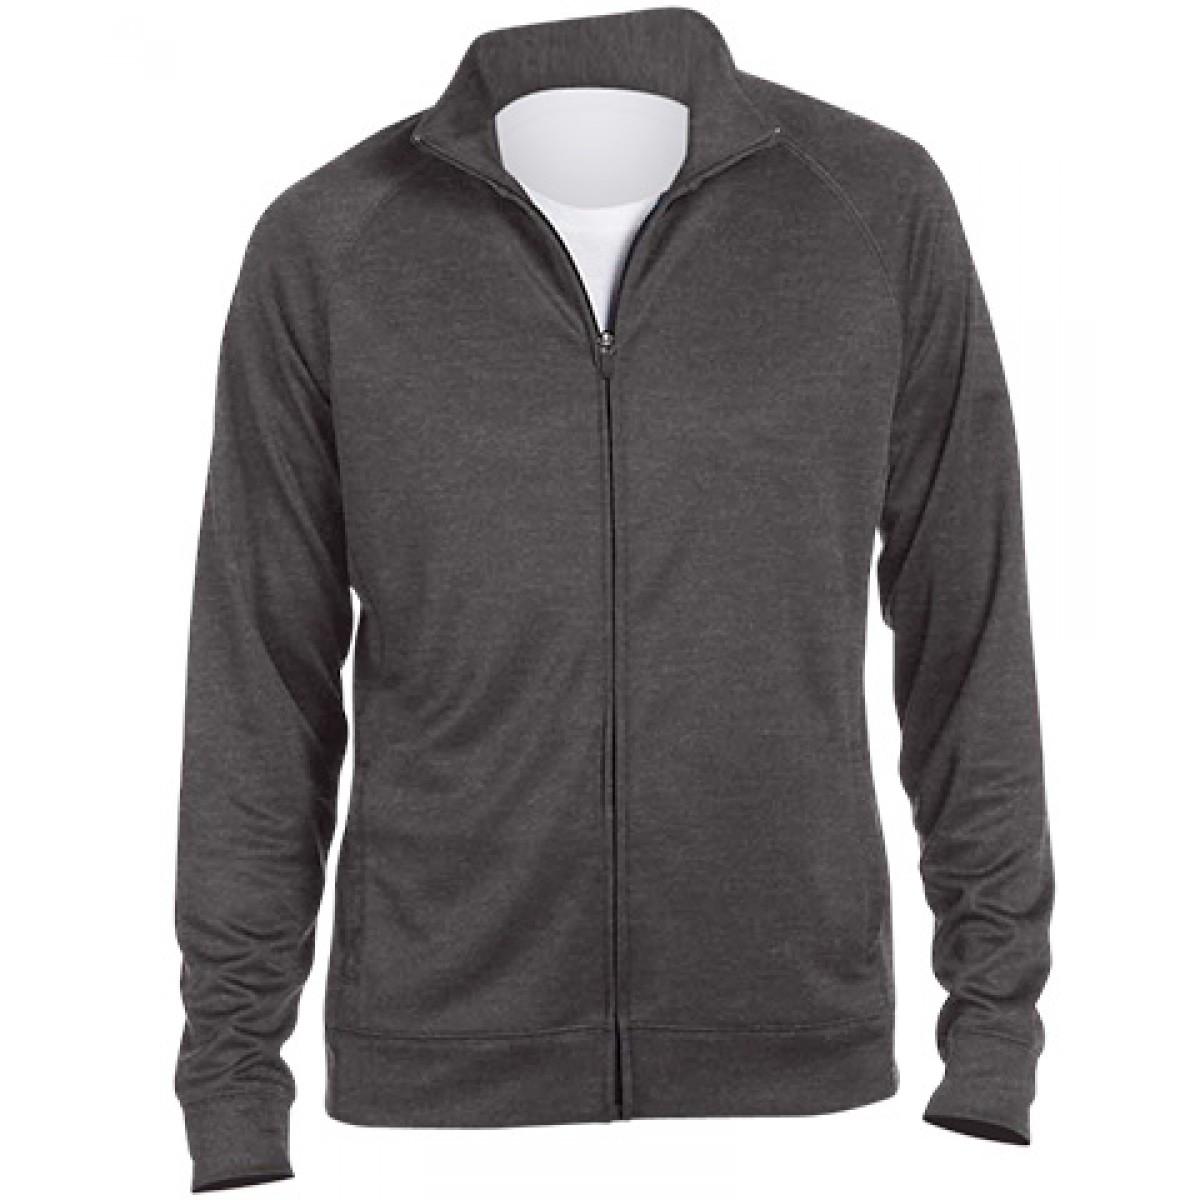 Men's Lightweight Sports Jacket-Sports Grey-YM